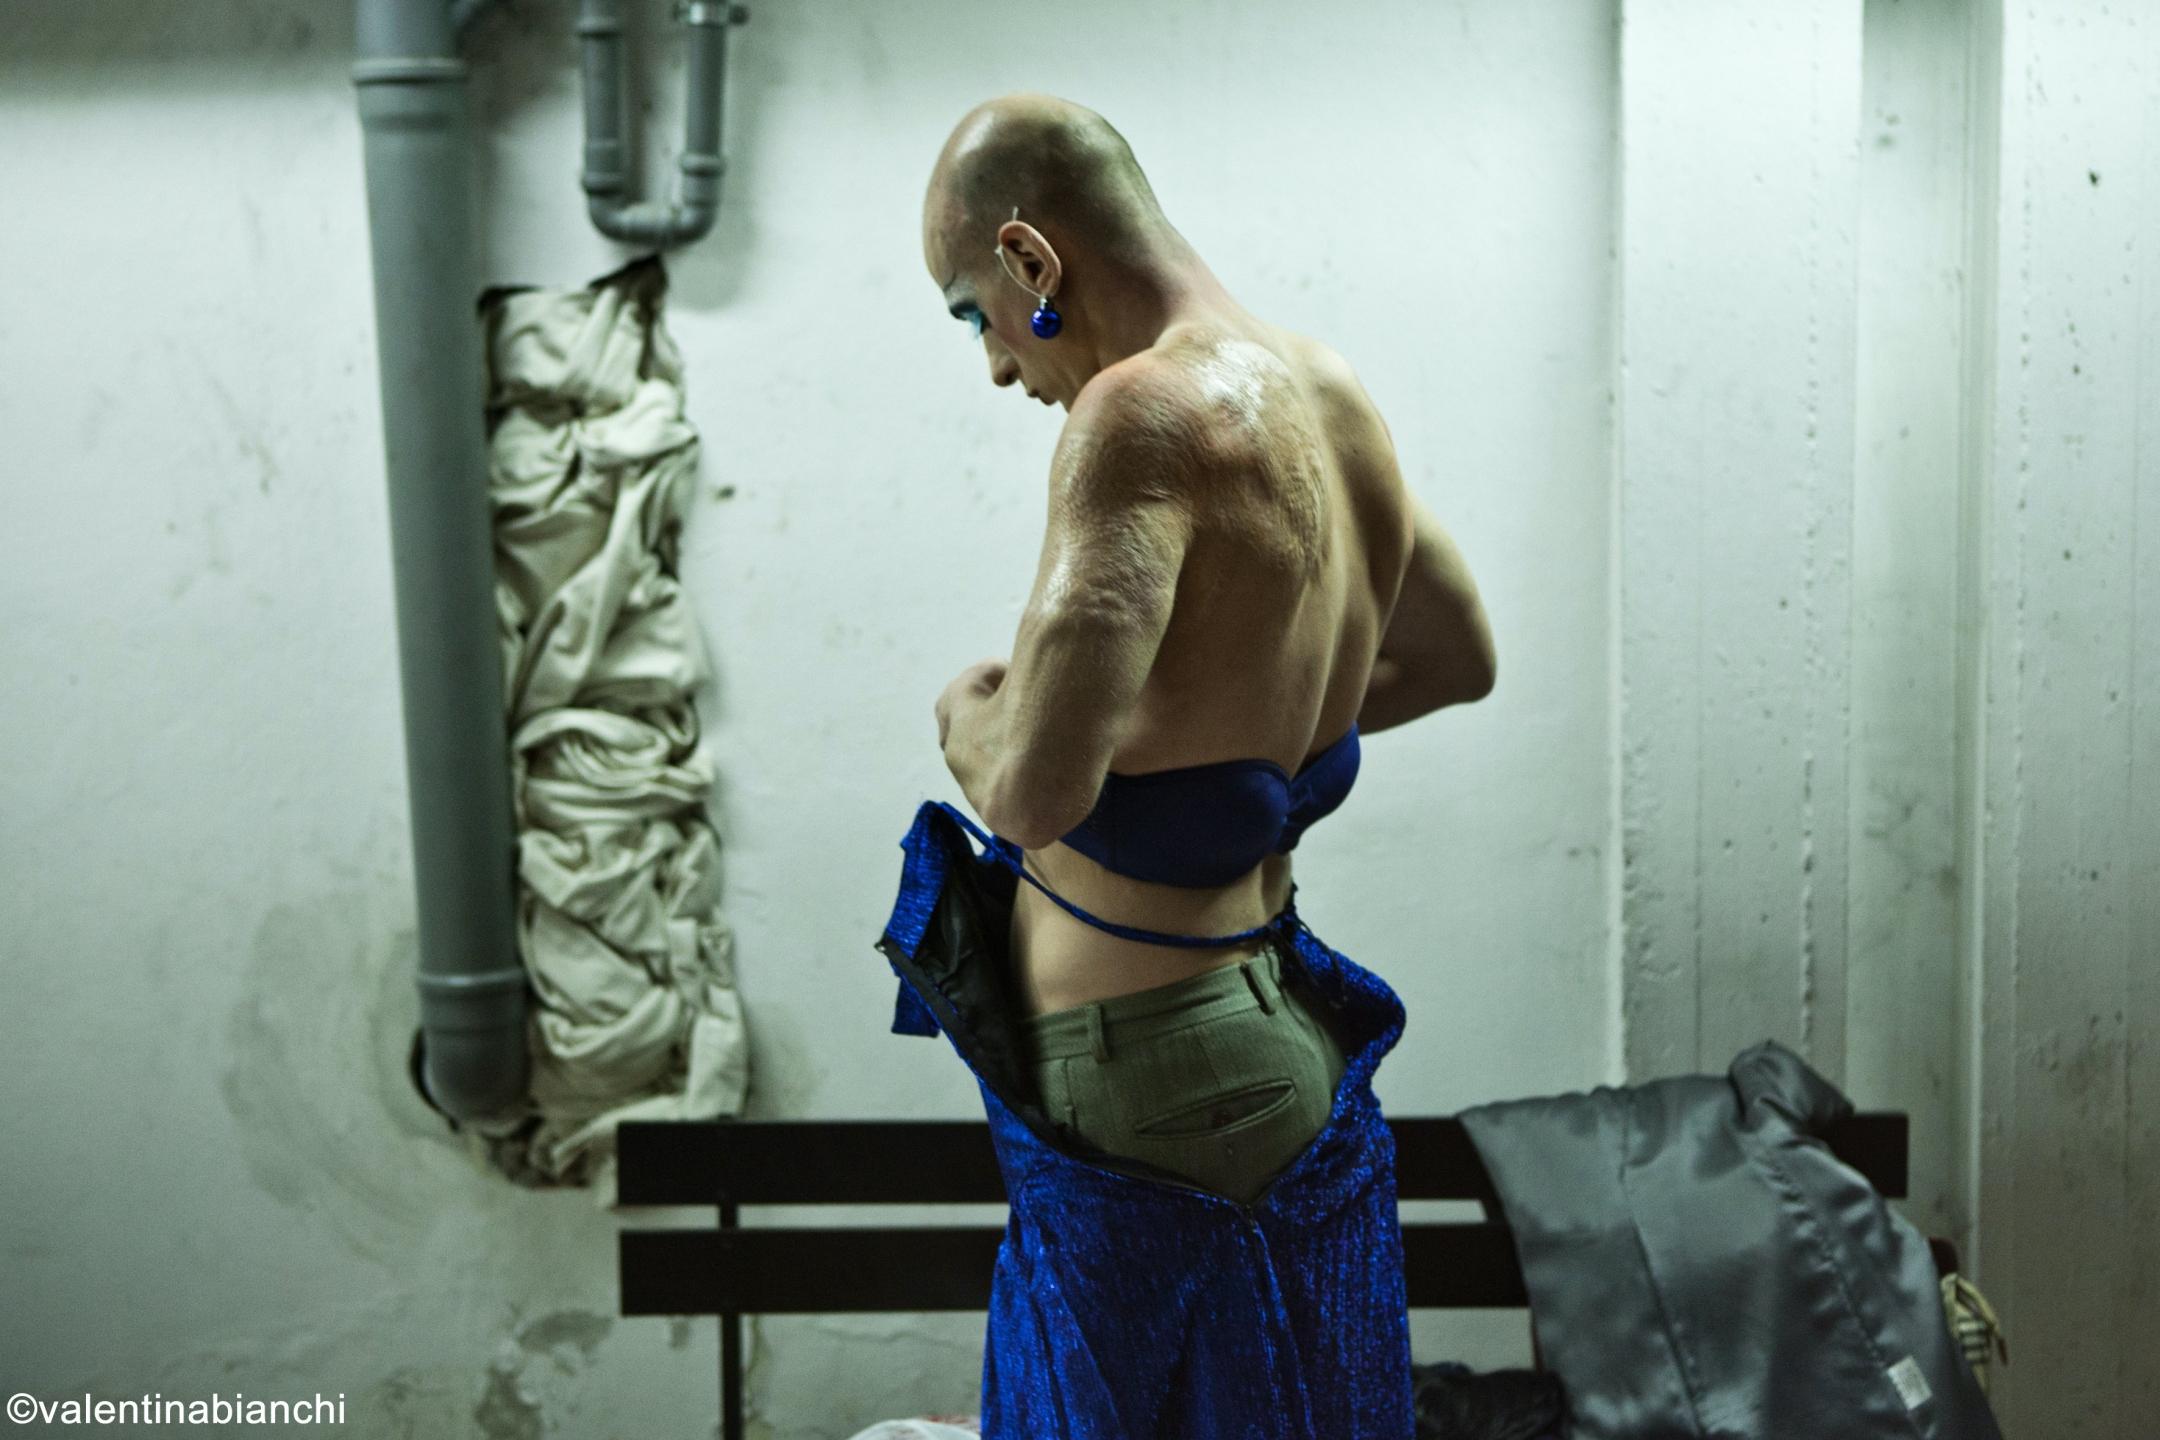 backstage-ulisse-romano-ph-valentina-bianchi-2020-01-16-18-17-22-utc.jpg